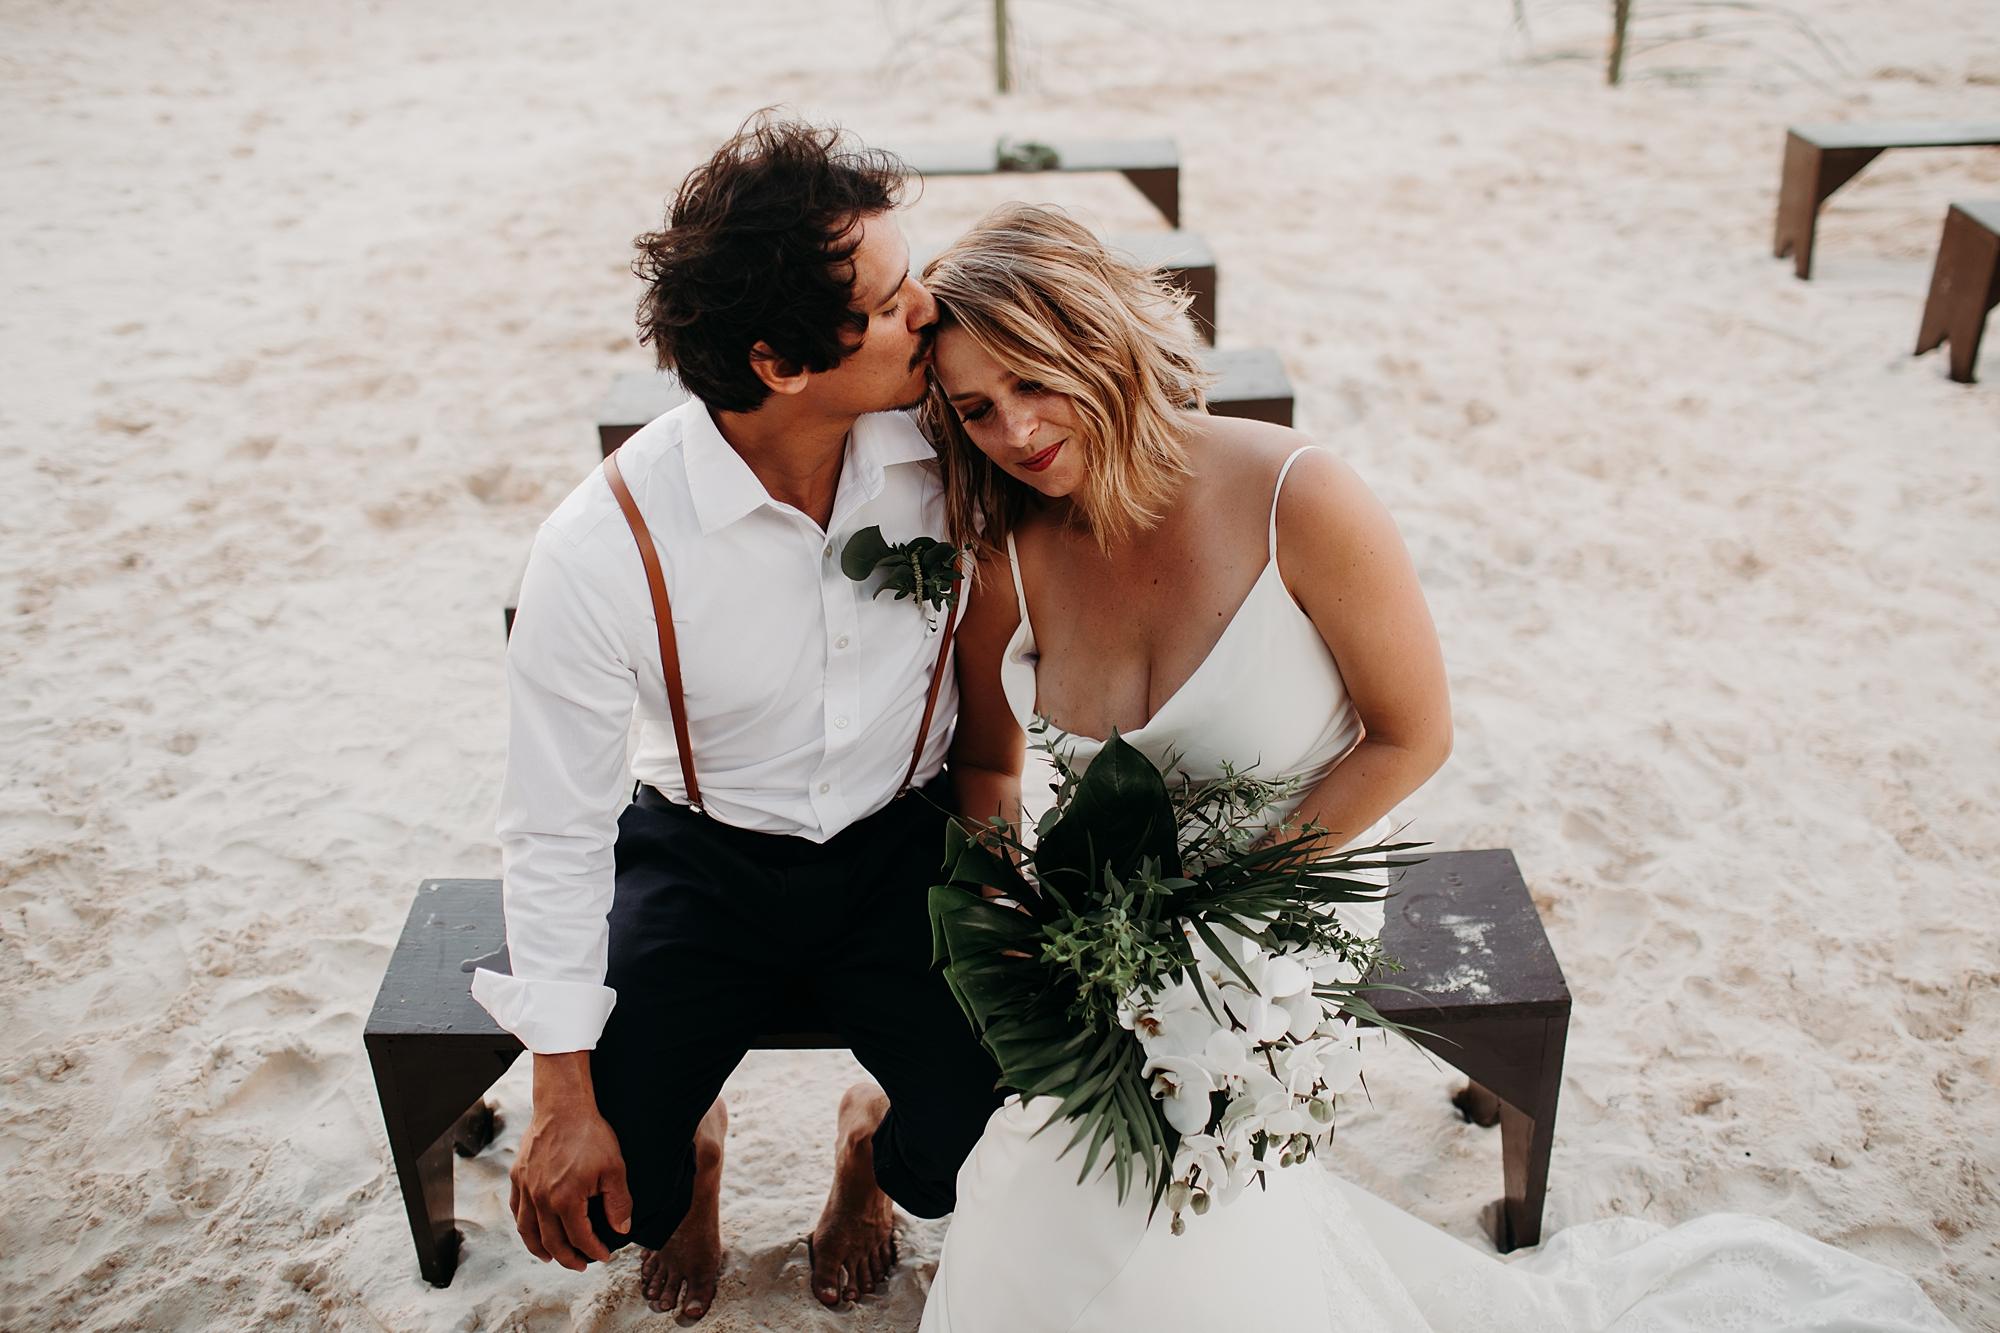 Danielle-San-Antonio-Wedding-Photographer-231_WEB.jpg